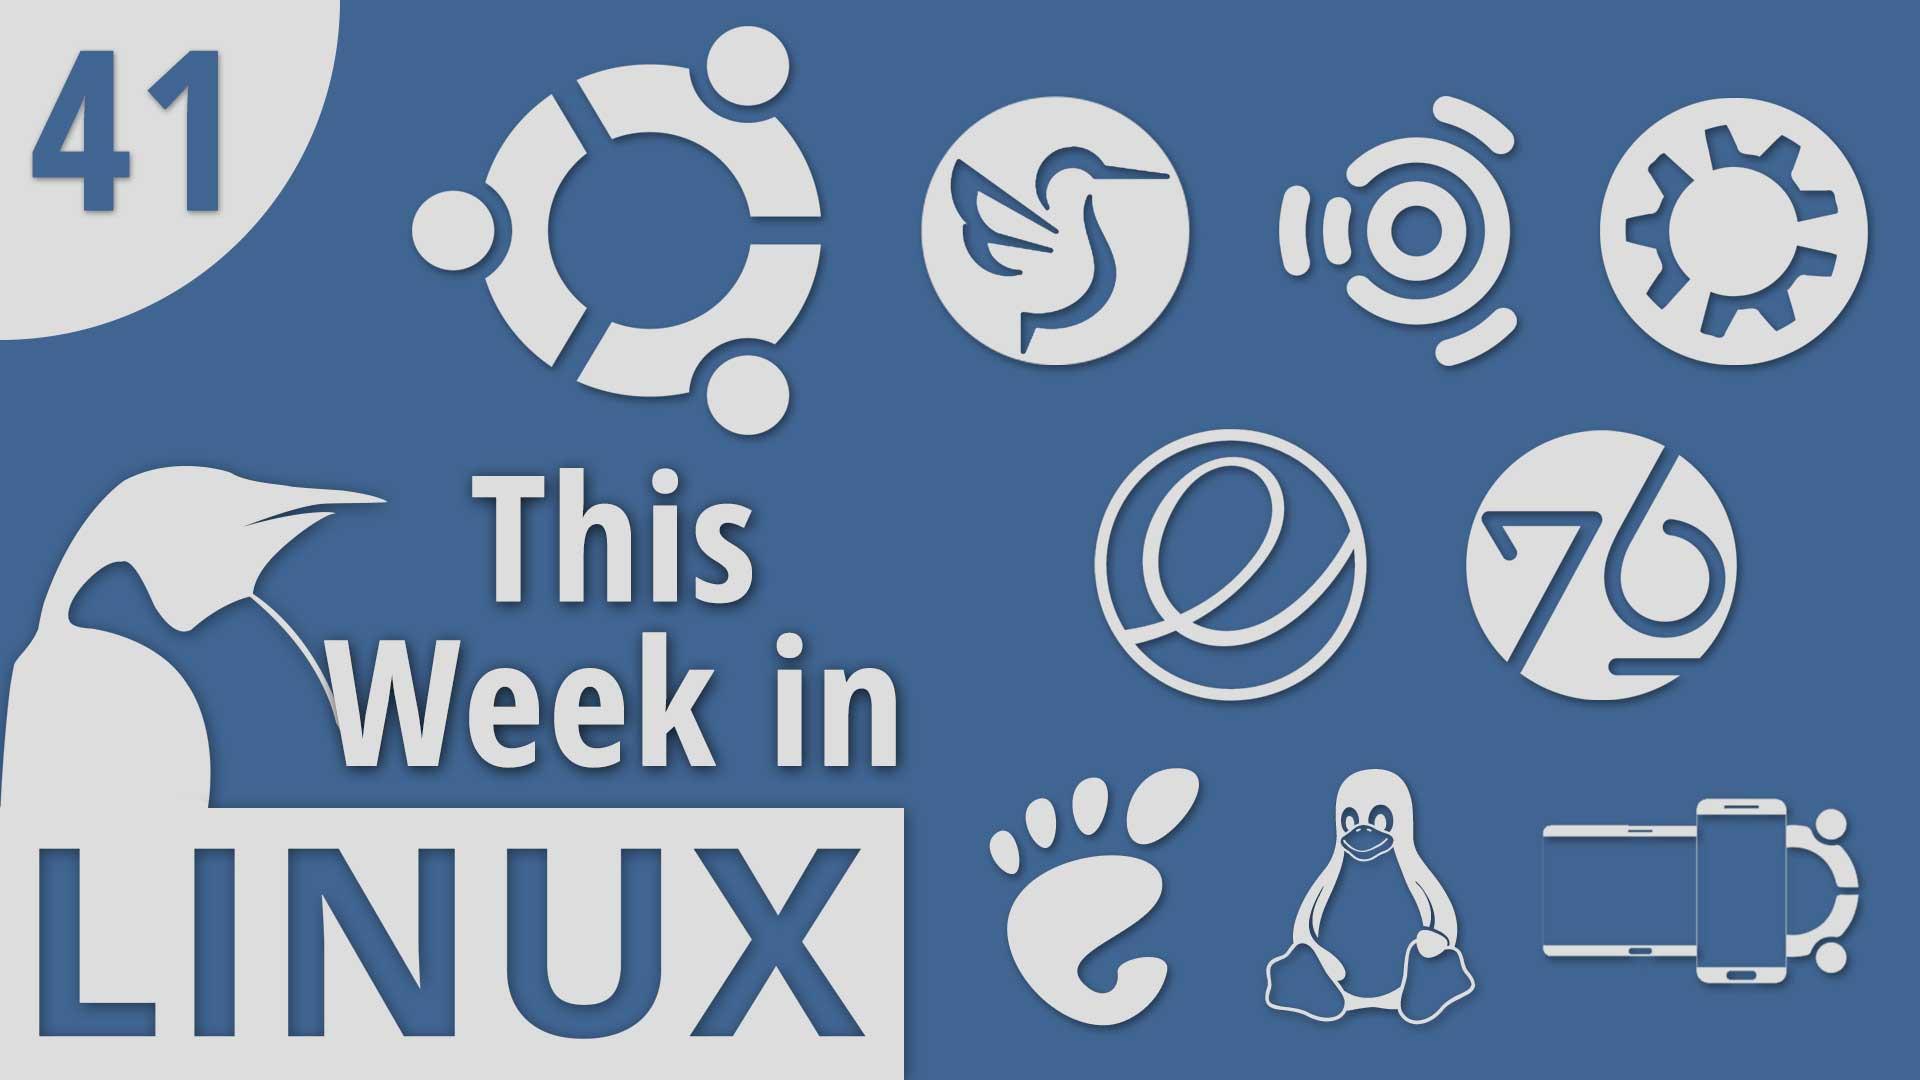 Episode 41 | This Week in Linux – TuxDigital